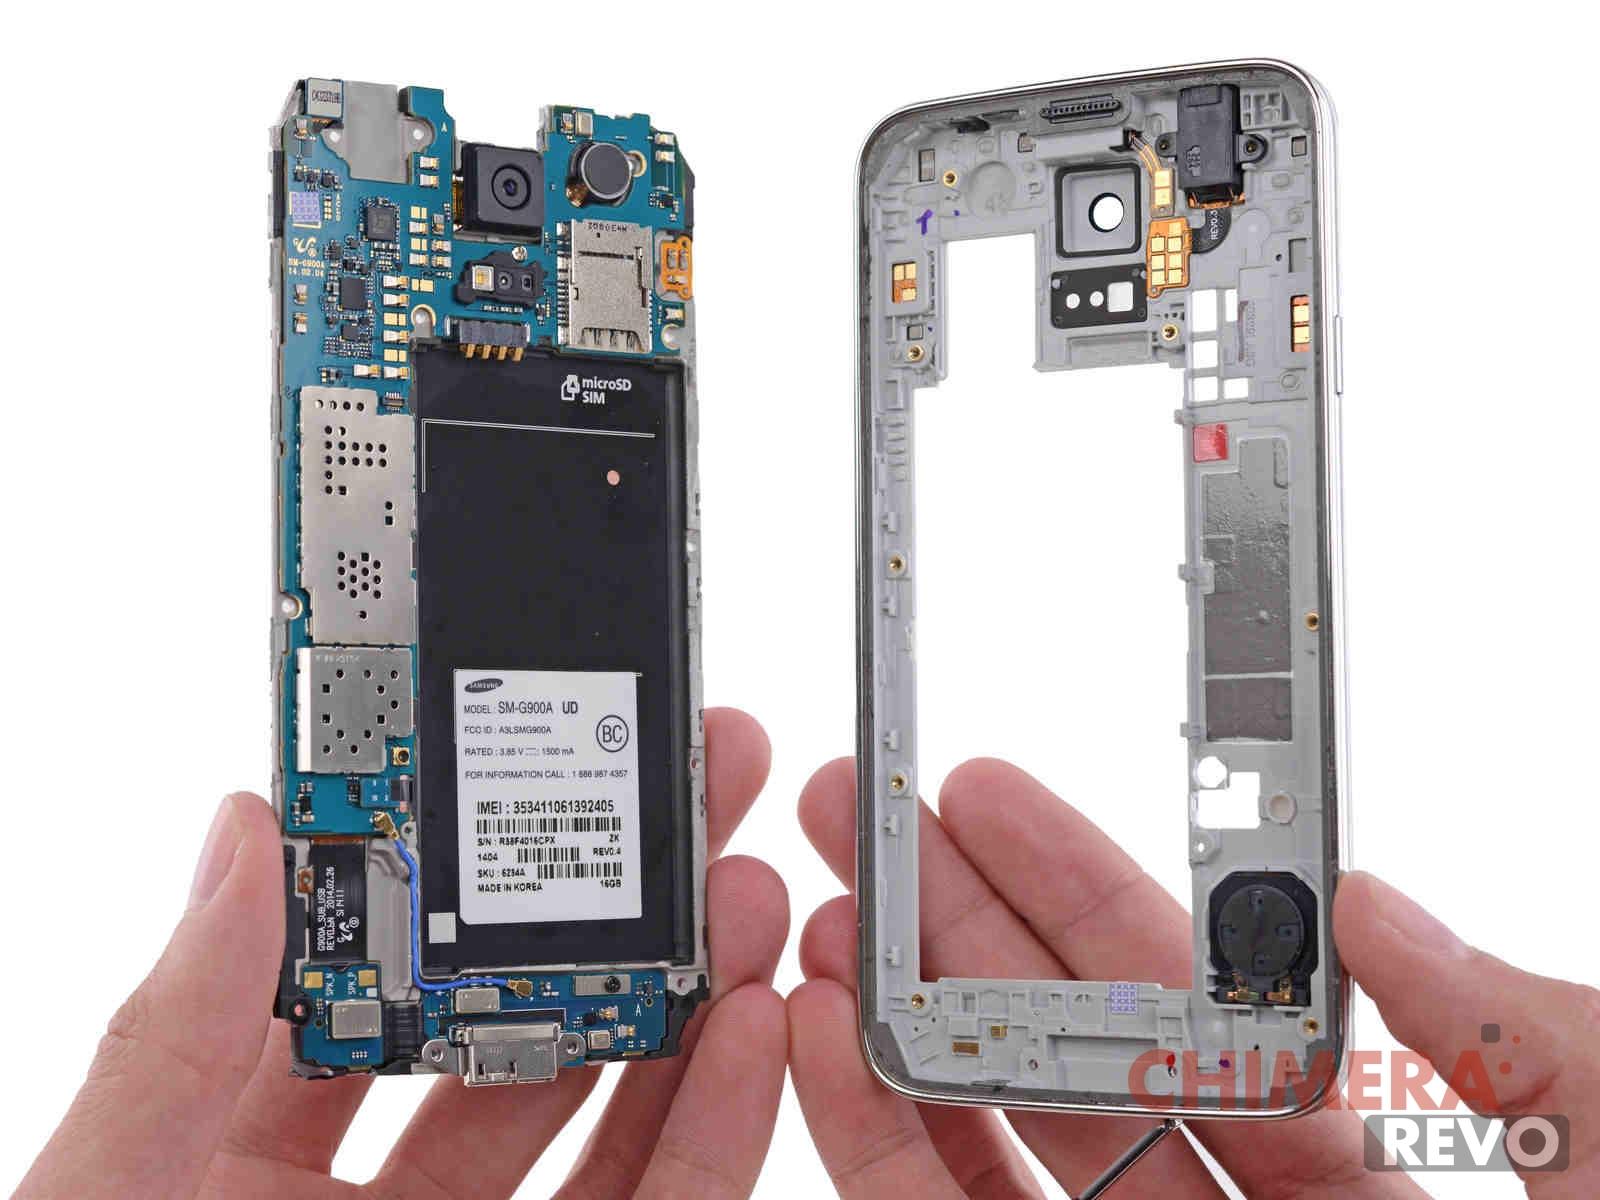 Samsung Galaxy S5 Smontato Ifixit 165344